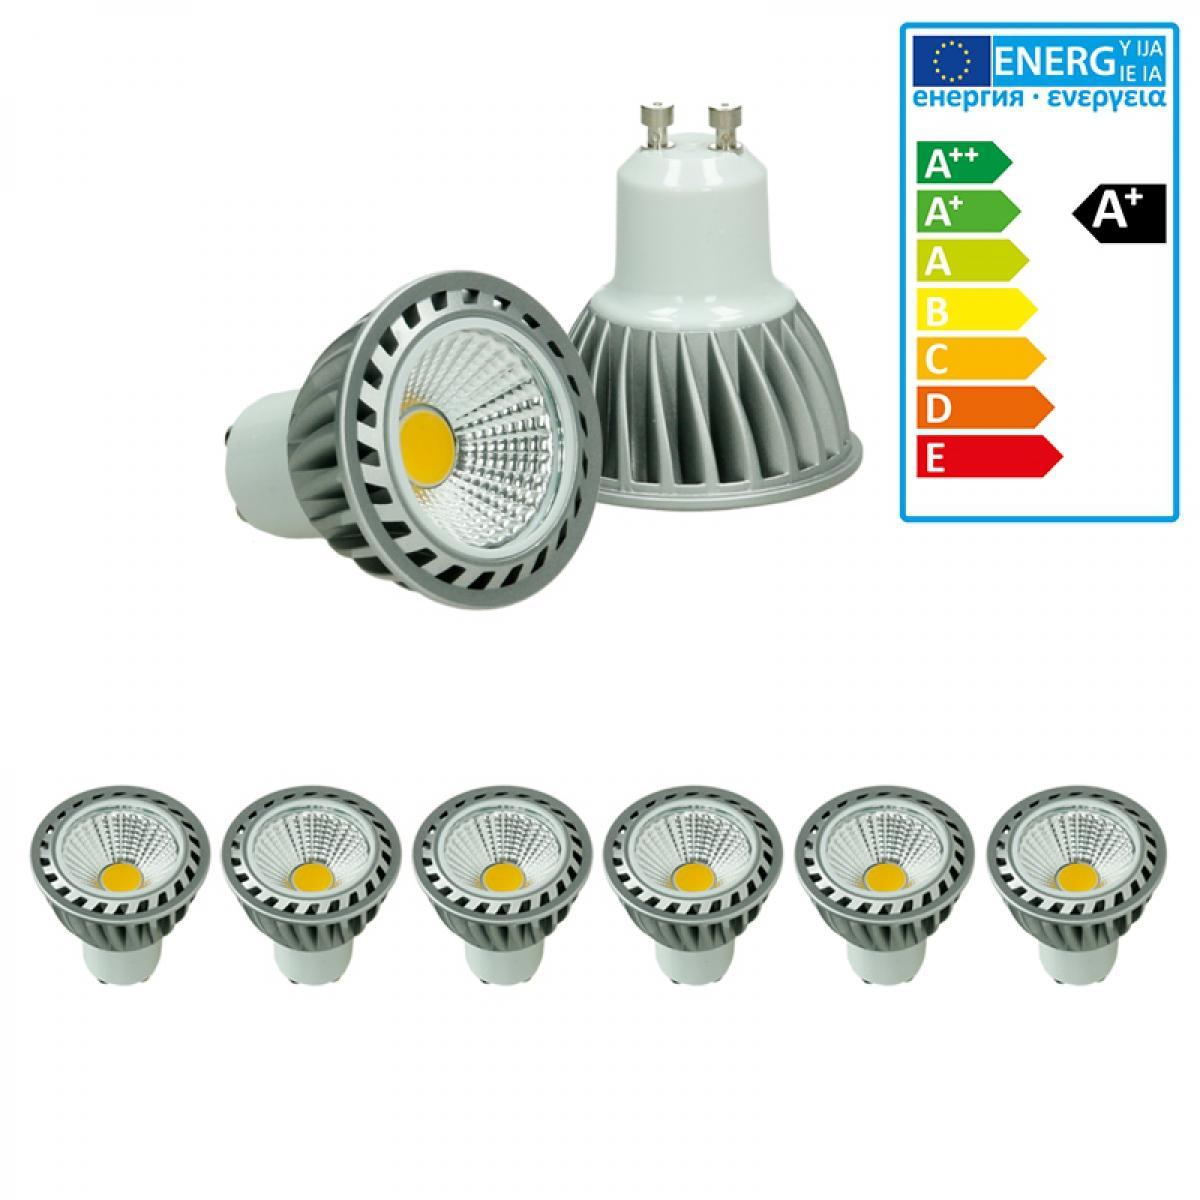 Ecd Germany ECD Germany 6-Pack 4W GU10 LED Spot Remplace 20W Halogène 220-240V 60 ° Angle de faisceau 243 Lumen 2800K Chaud Blanc Am